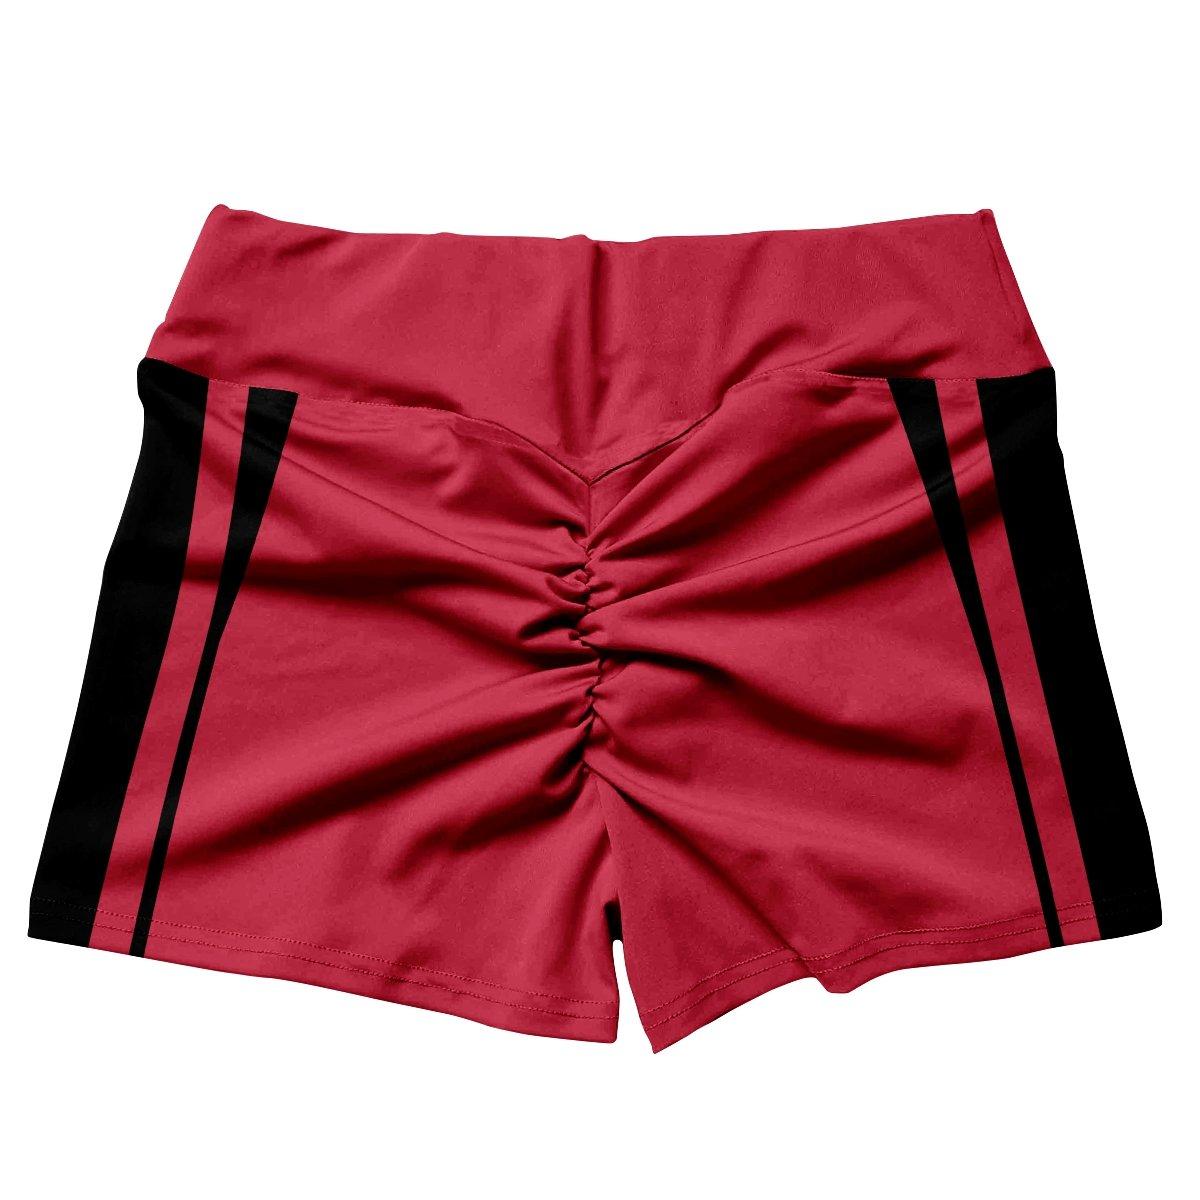 team nekoma active wear set 497923 - Anime Swimsuits